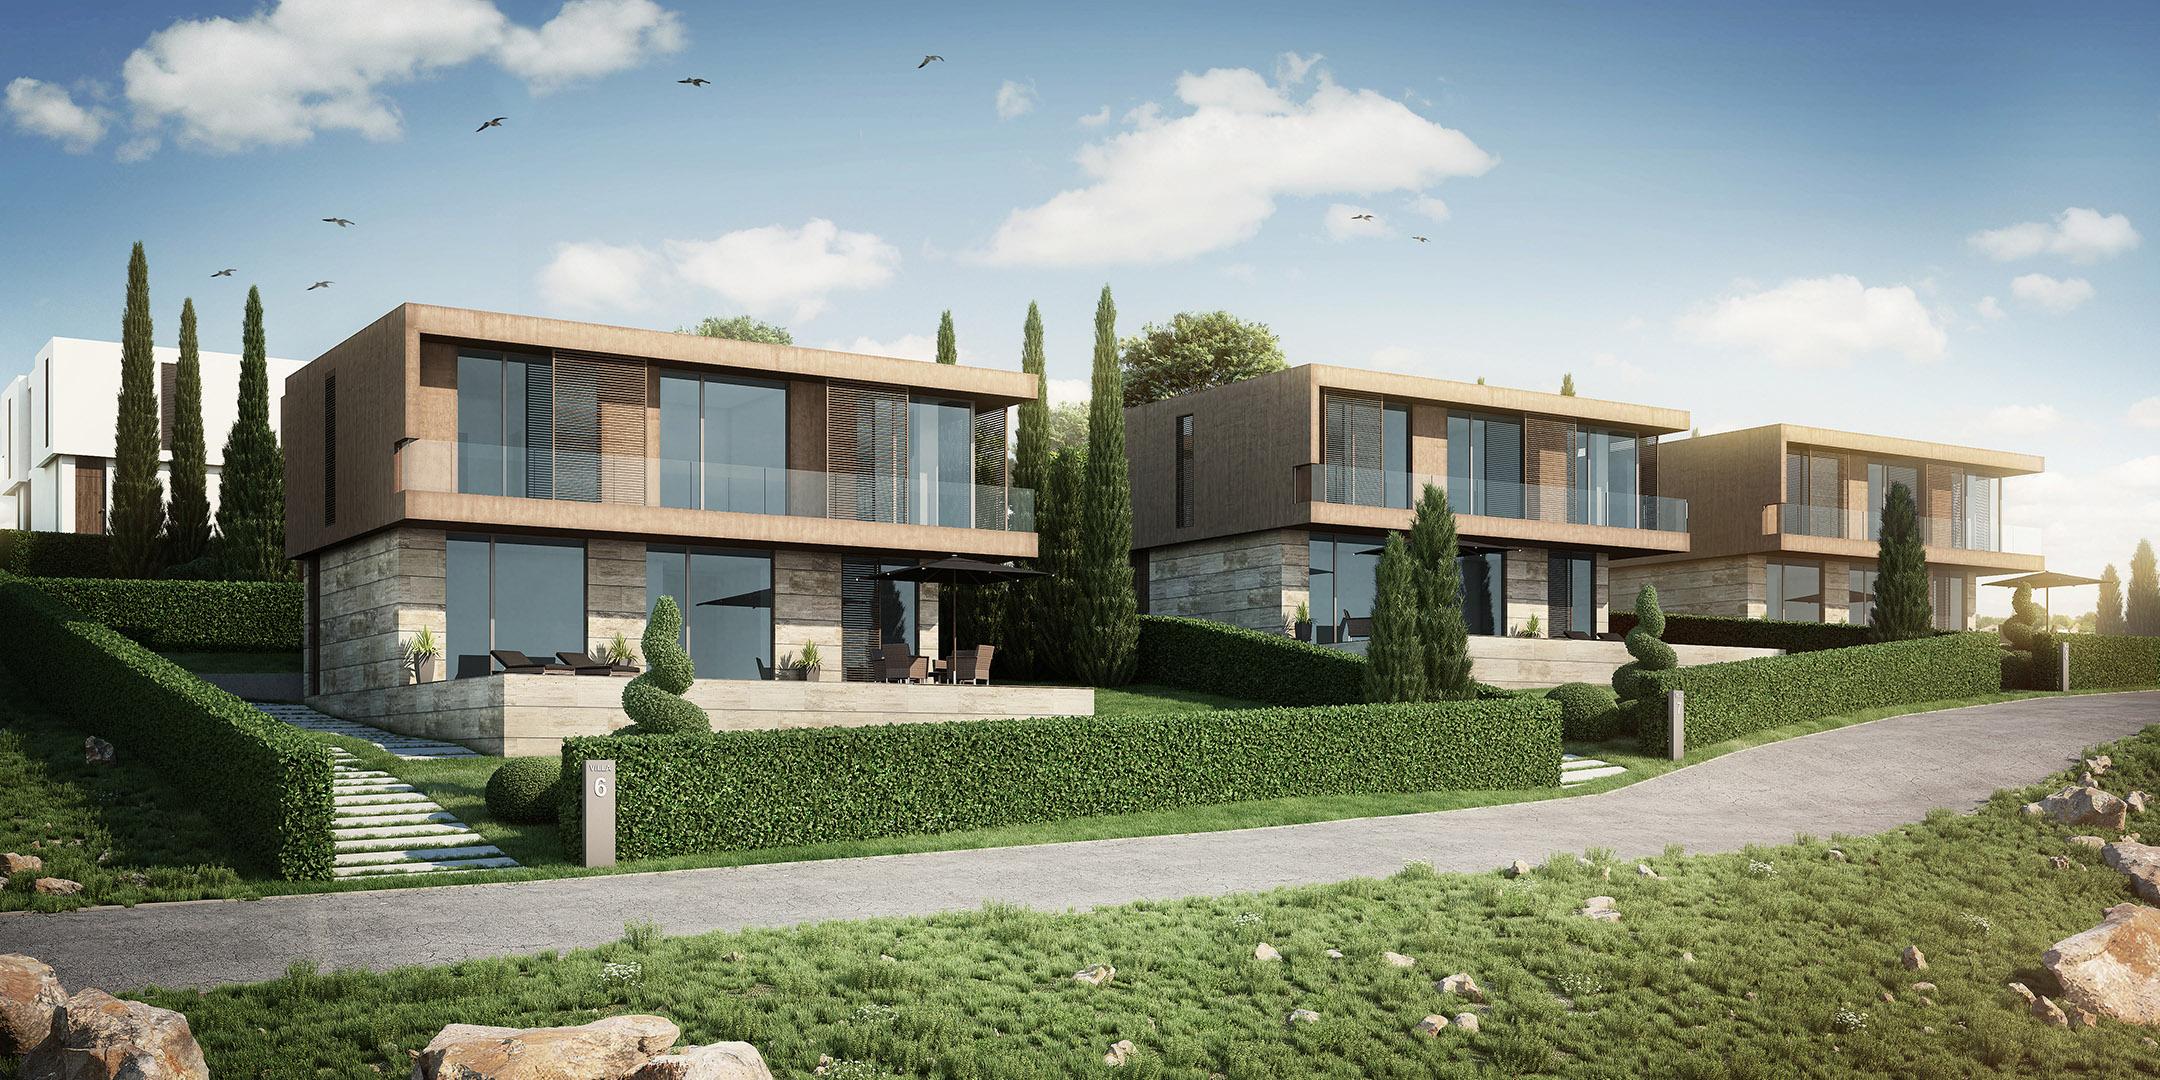 Architecture studio Varna